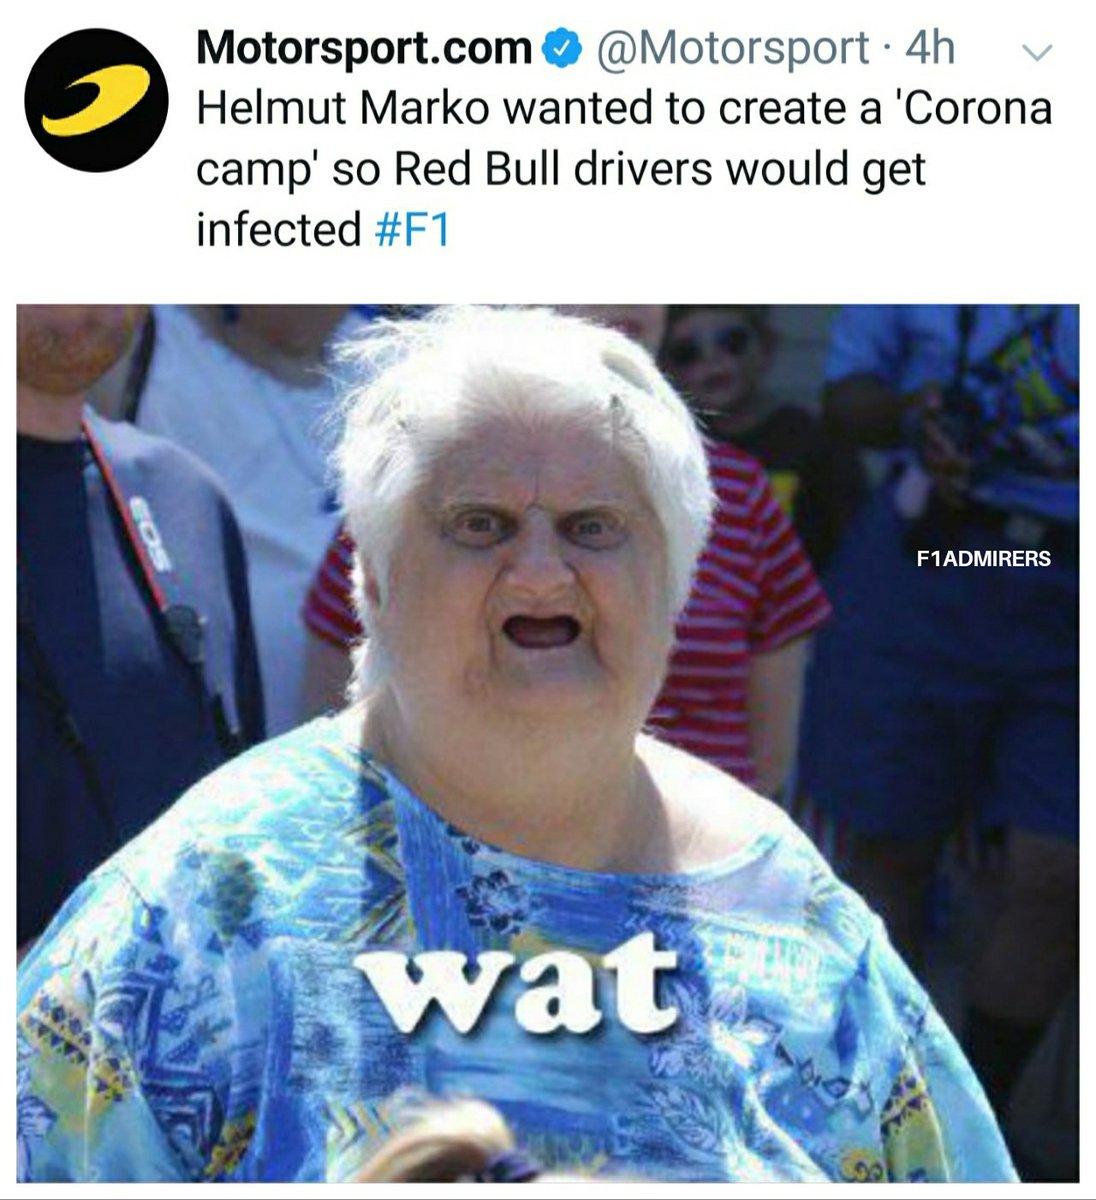 Ok then. -- #HelmutMarko #Vettel #LewisHamilton #ForzaVettel #TeamLH #Leclerc #Valtteri #ScuderiaFerrari #MercedesAMGF1 #CS55 #DanielRicciardo #NicoHulkenberg #LanceStroll #KimiRaikkonen #SauberF1Team #RobertKubica #F1Driver #F1Fans #F1Cars #SimRacing #F1 #FormulaUno #Formula1